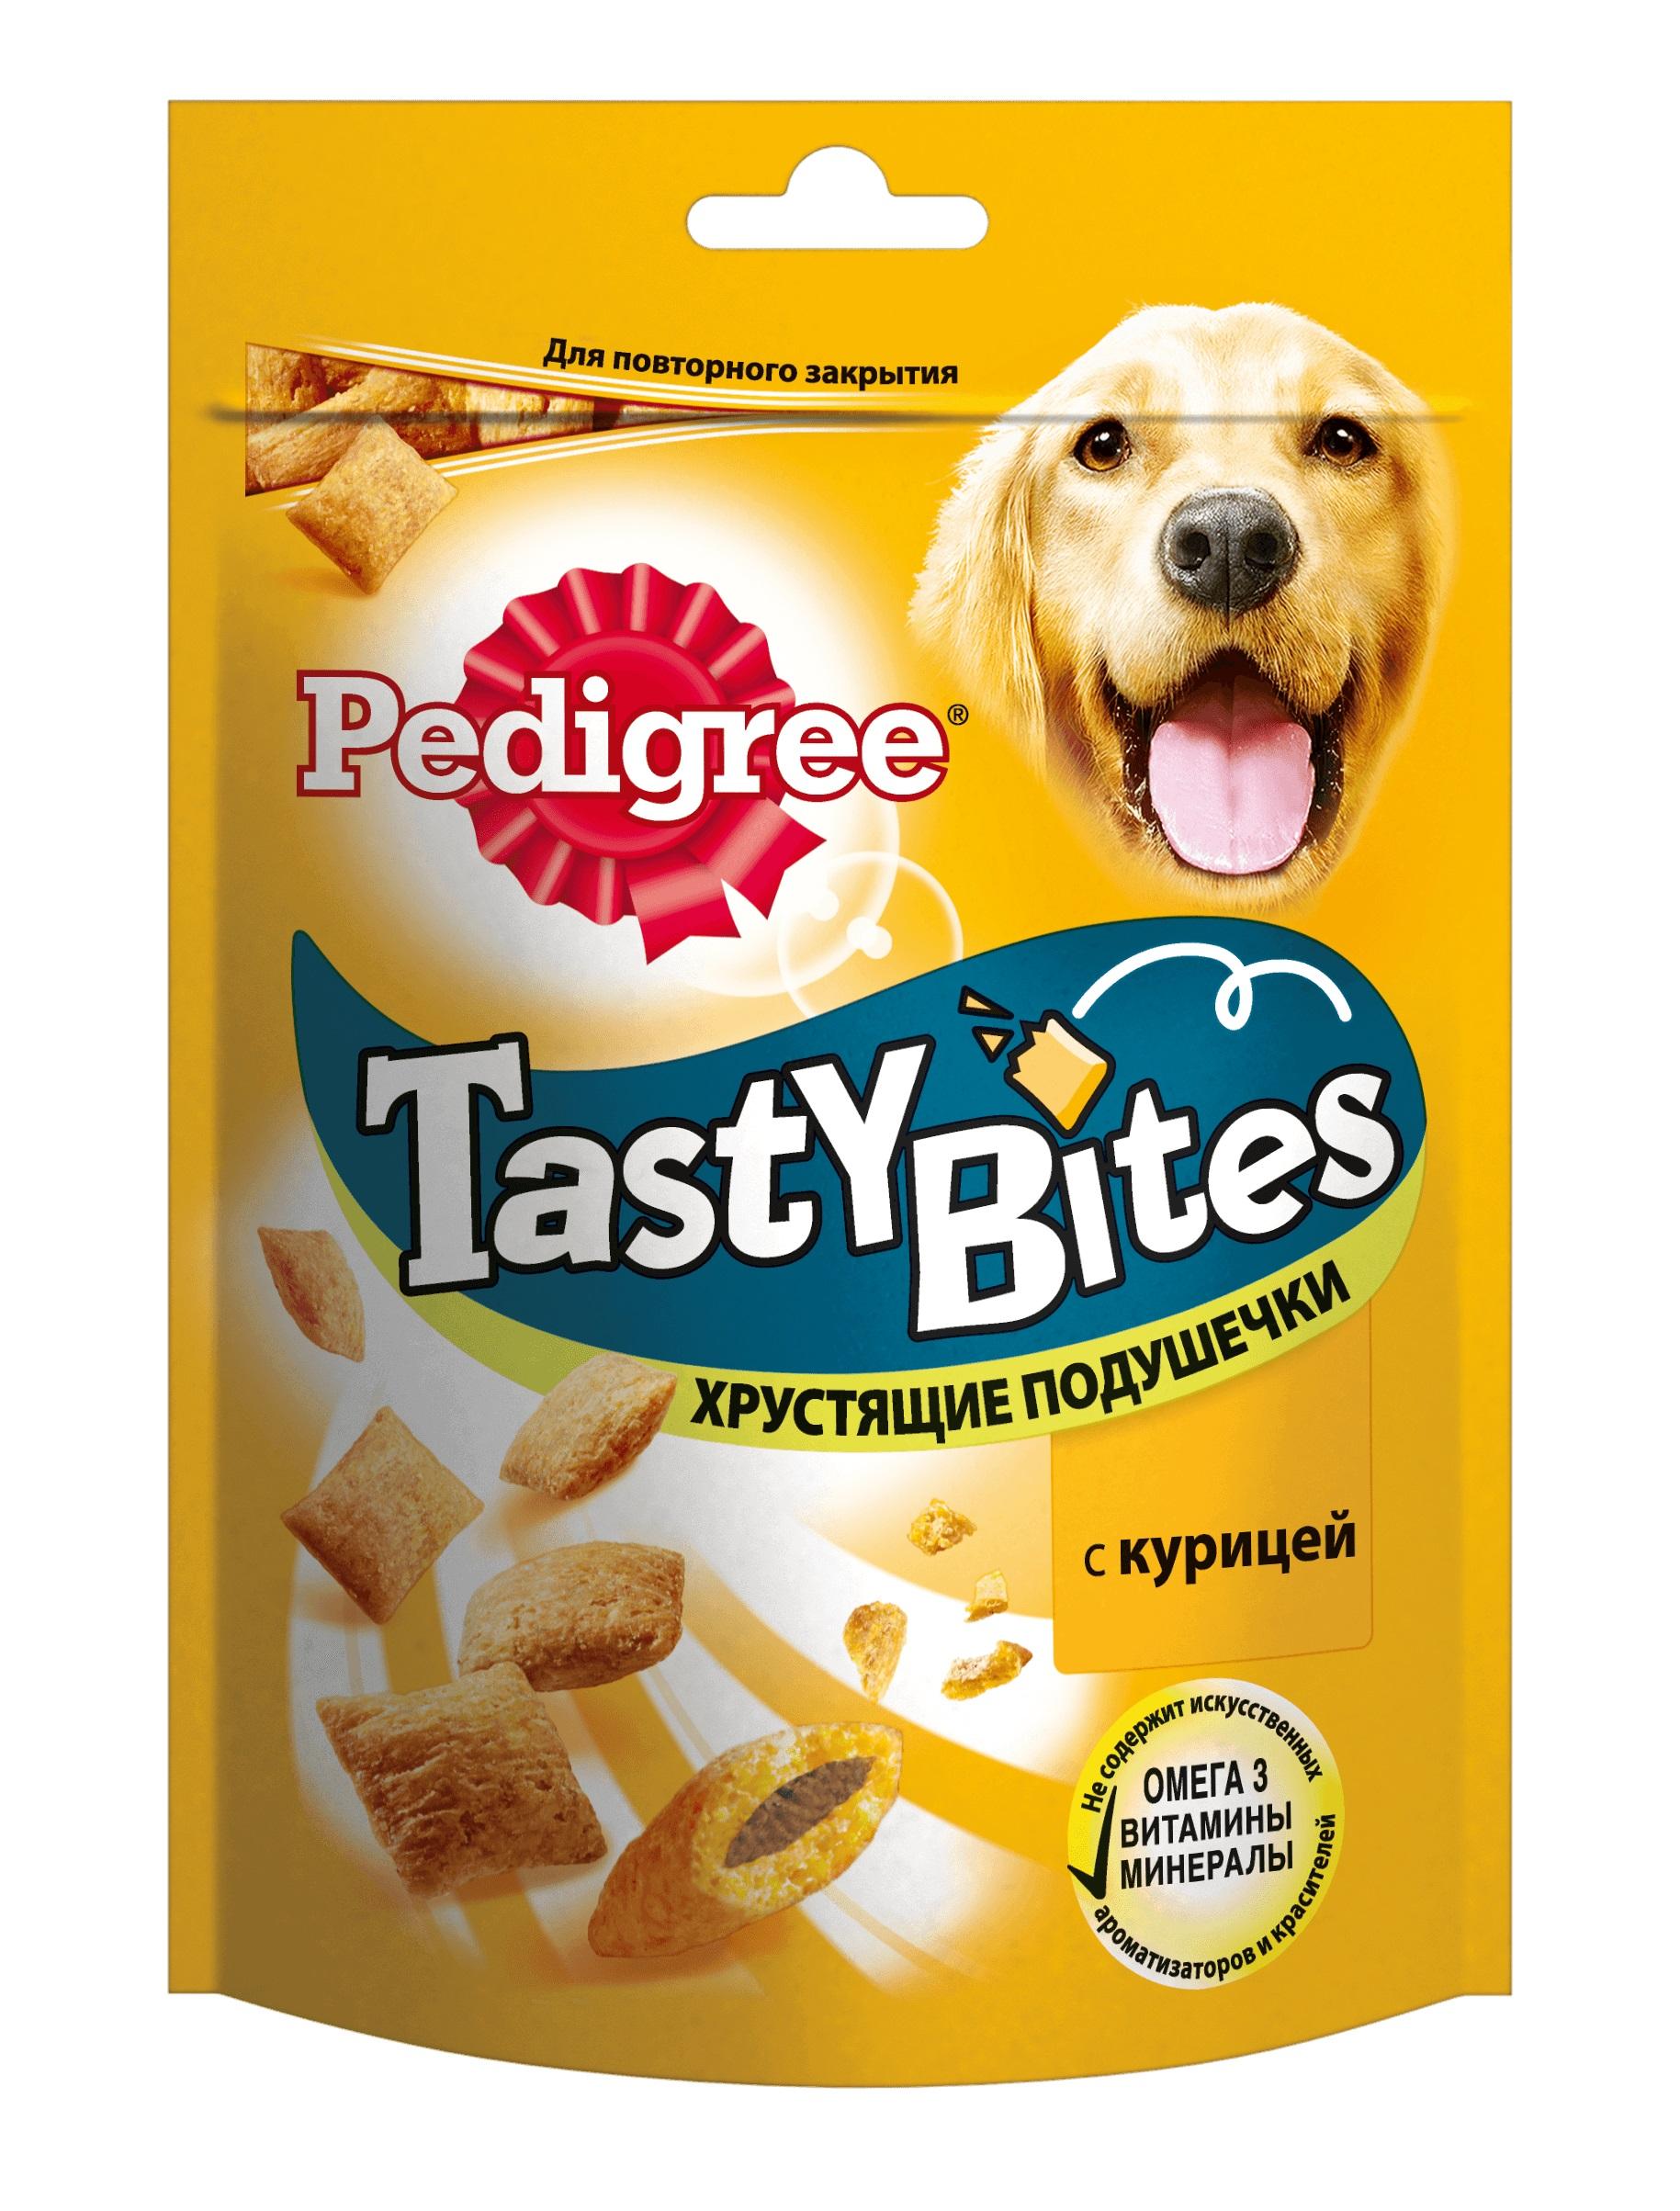 Лакомство для собак Pedigree Tasty Bites, подушечки, курица, 95г фото